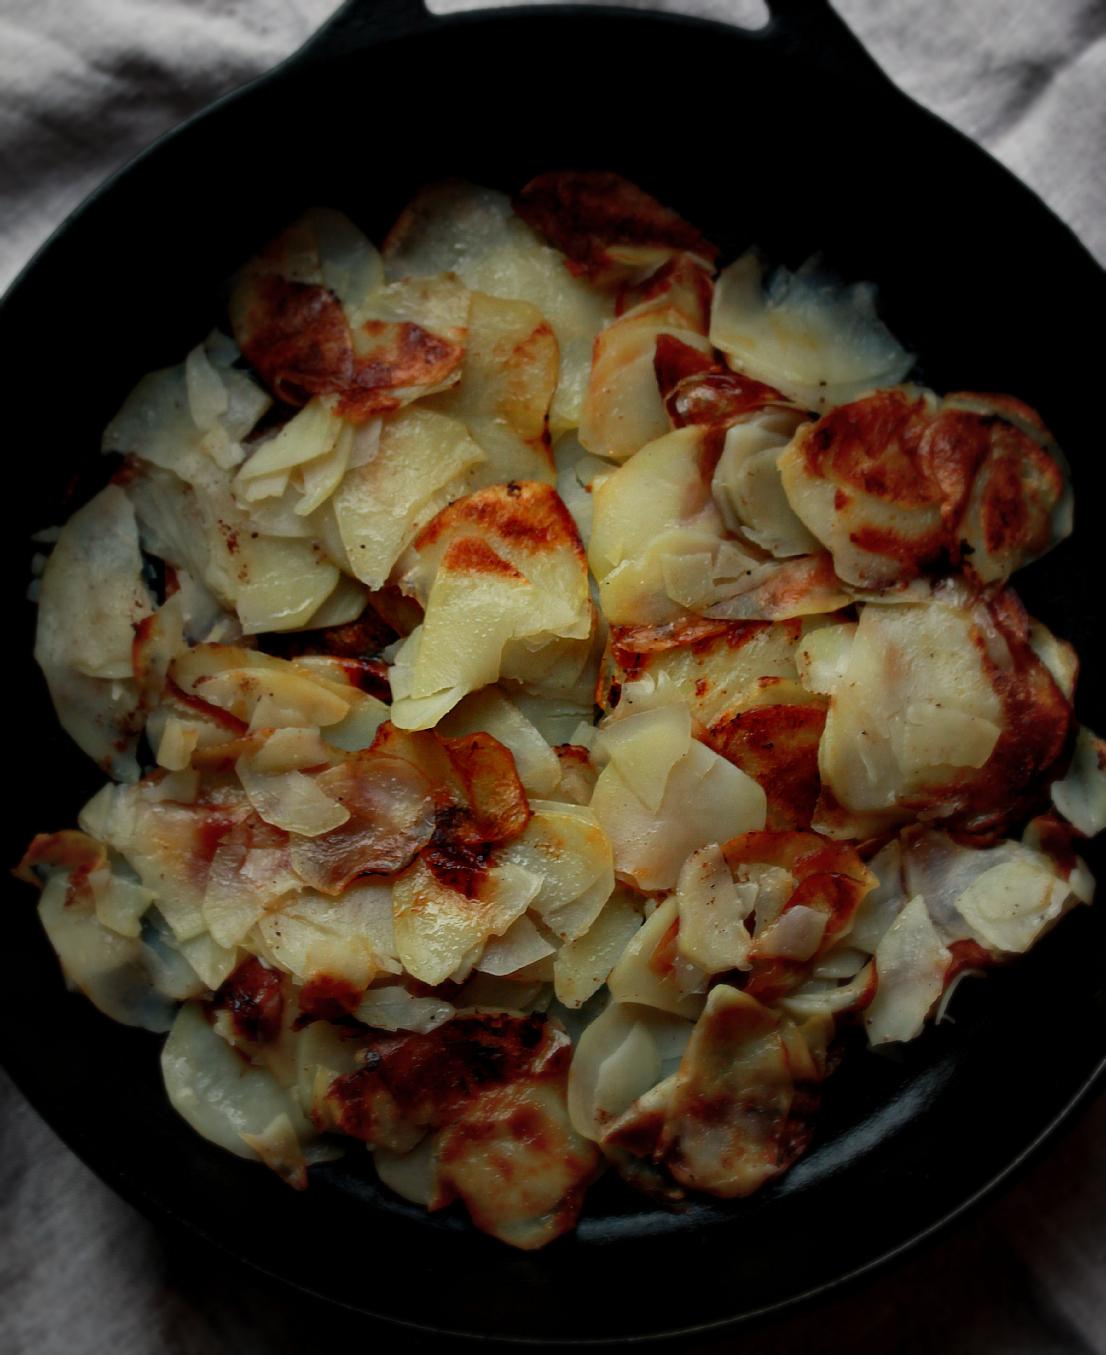 Crispy Potato Cake by Dena T Bray